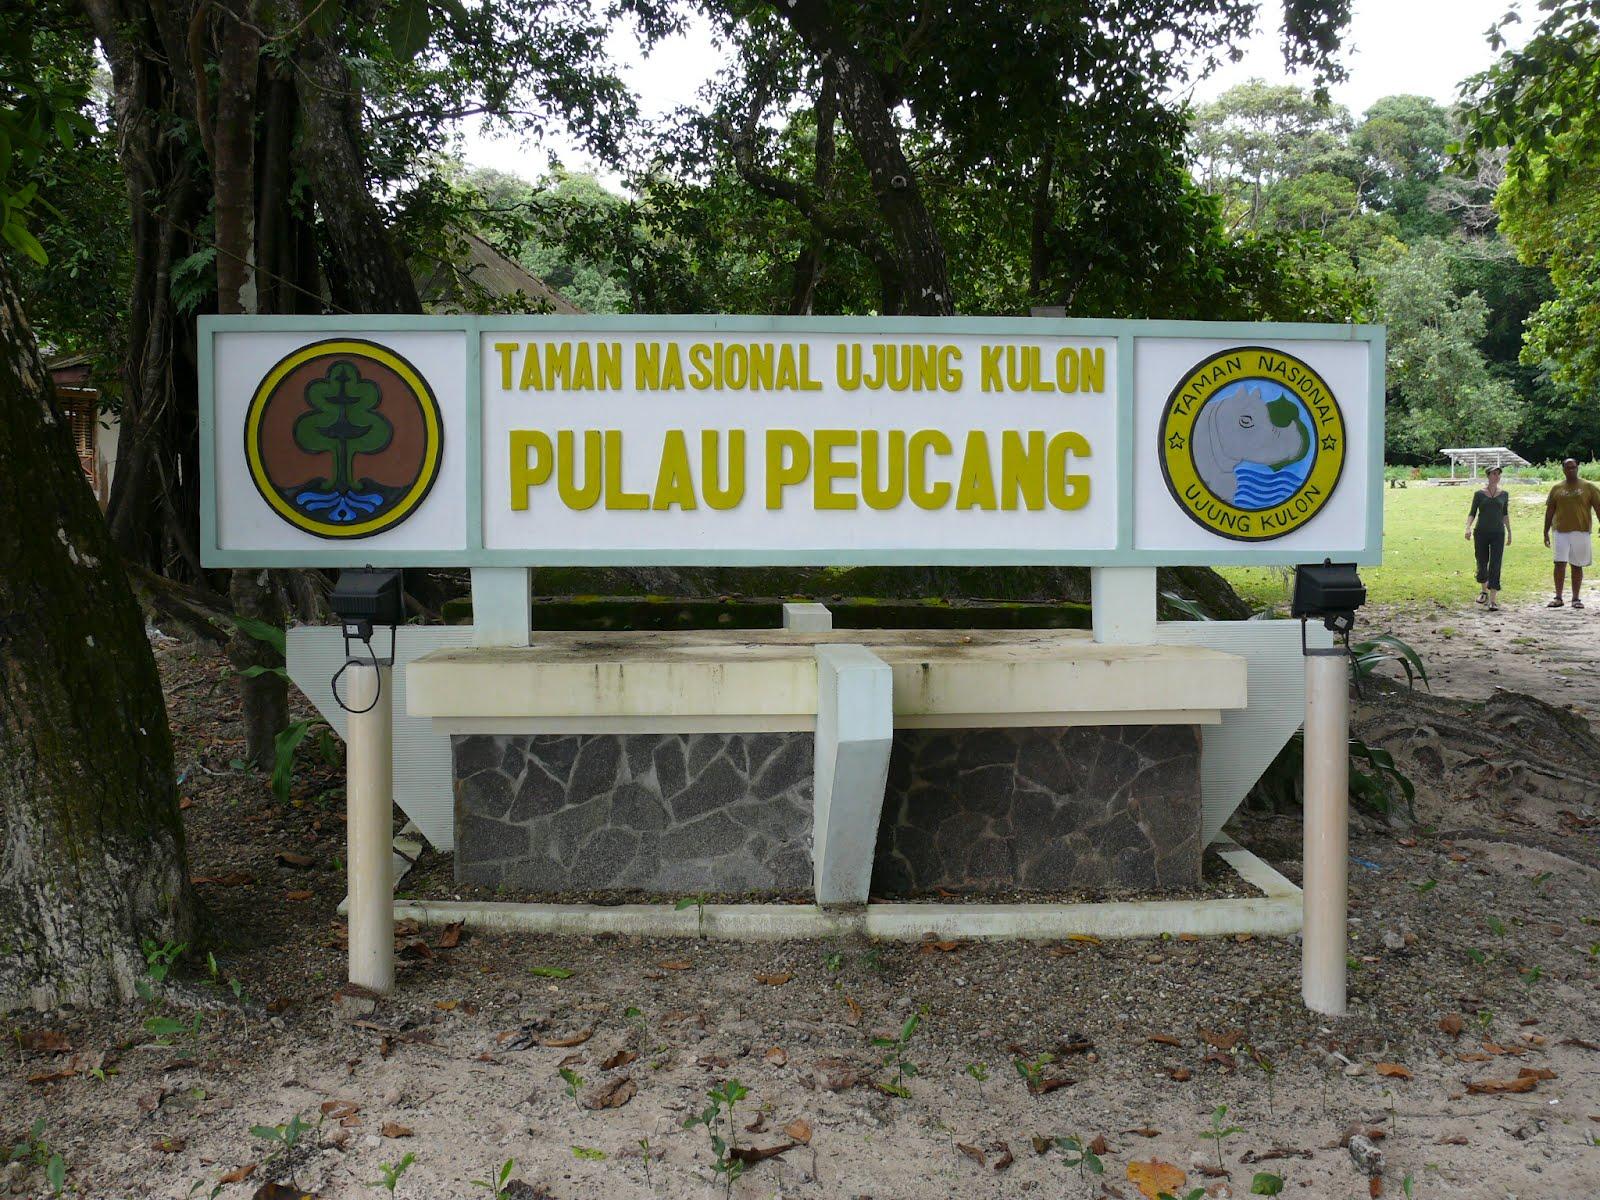 P1010380 Jpg Taman Nasional Ujung Kulon Kab Pandeglang